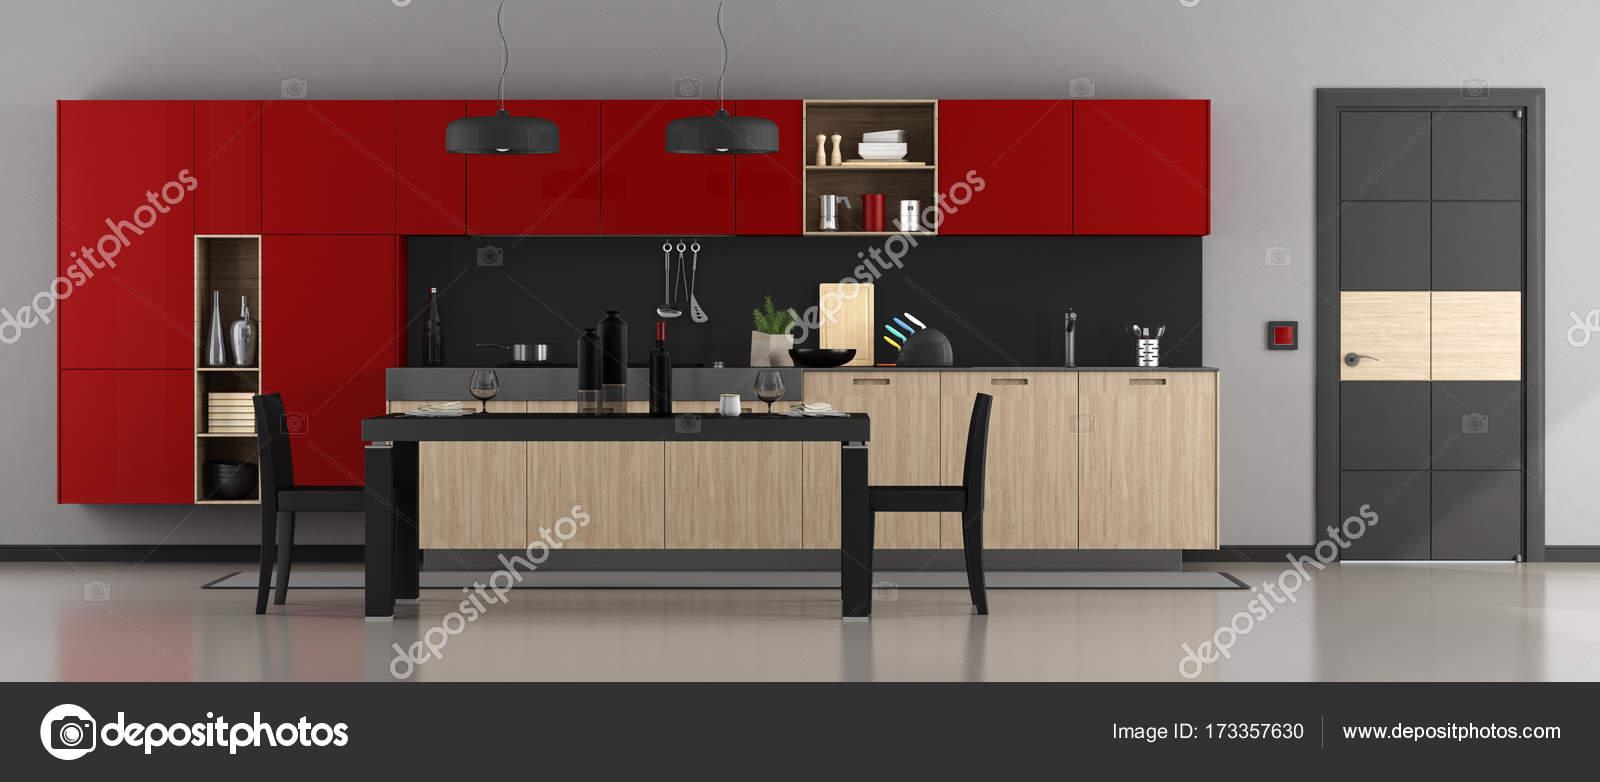 Cucina moderna rossa e nera — Foto Stock © archideaphoto #173357630